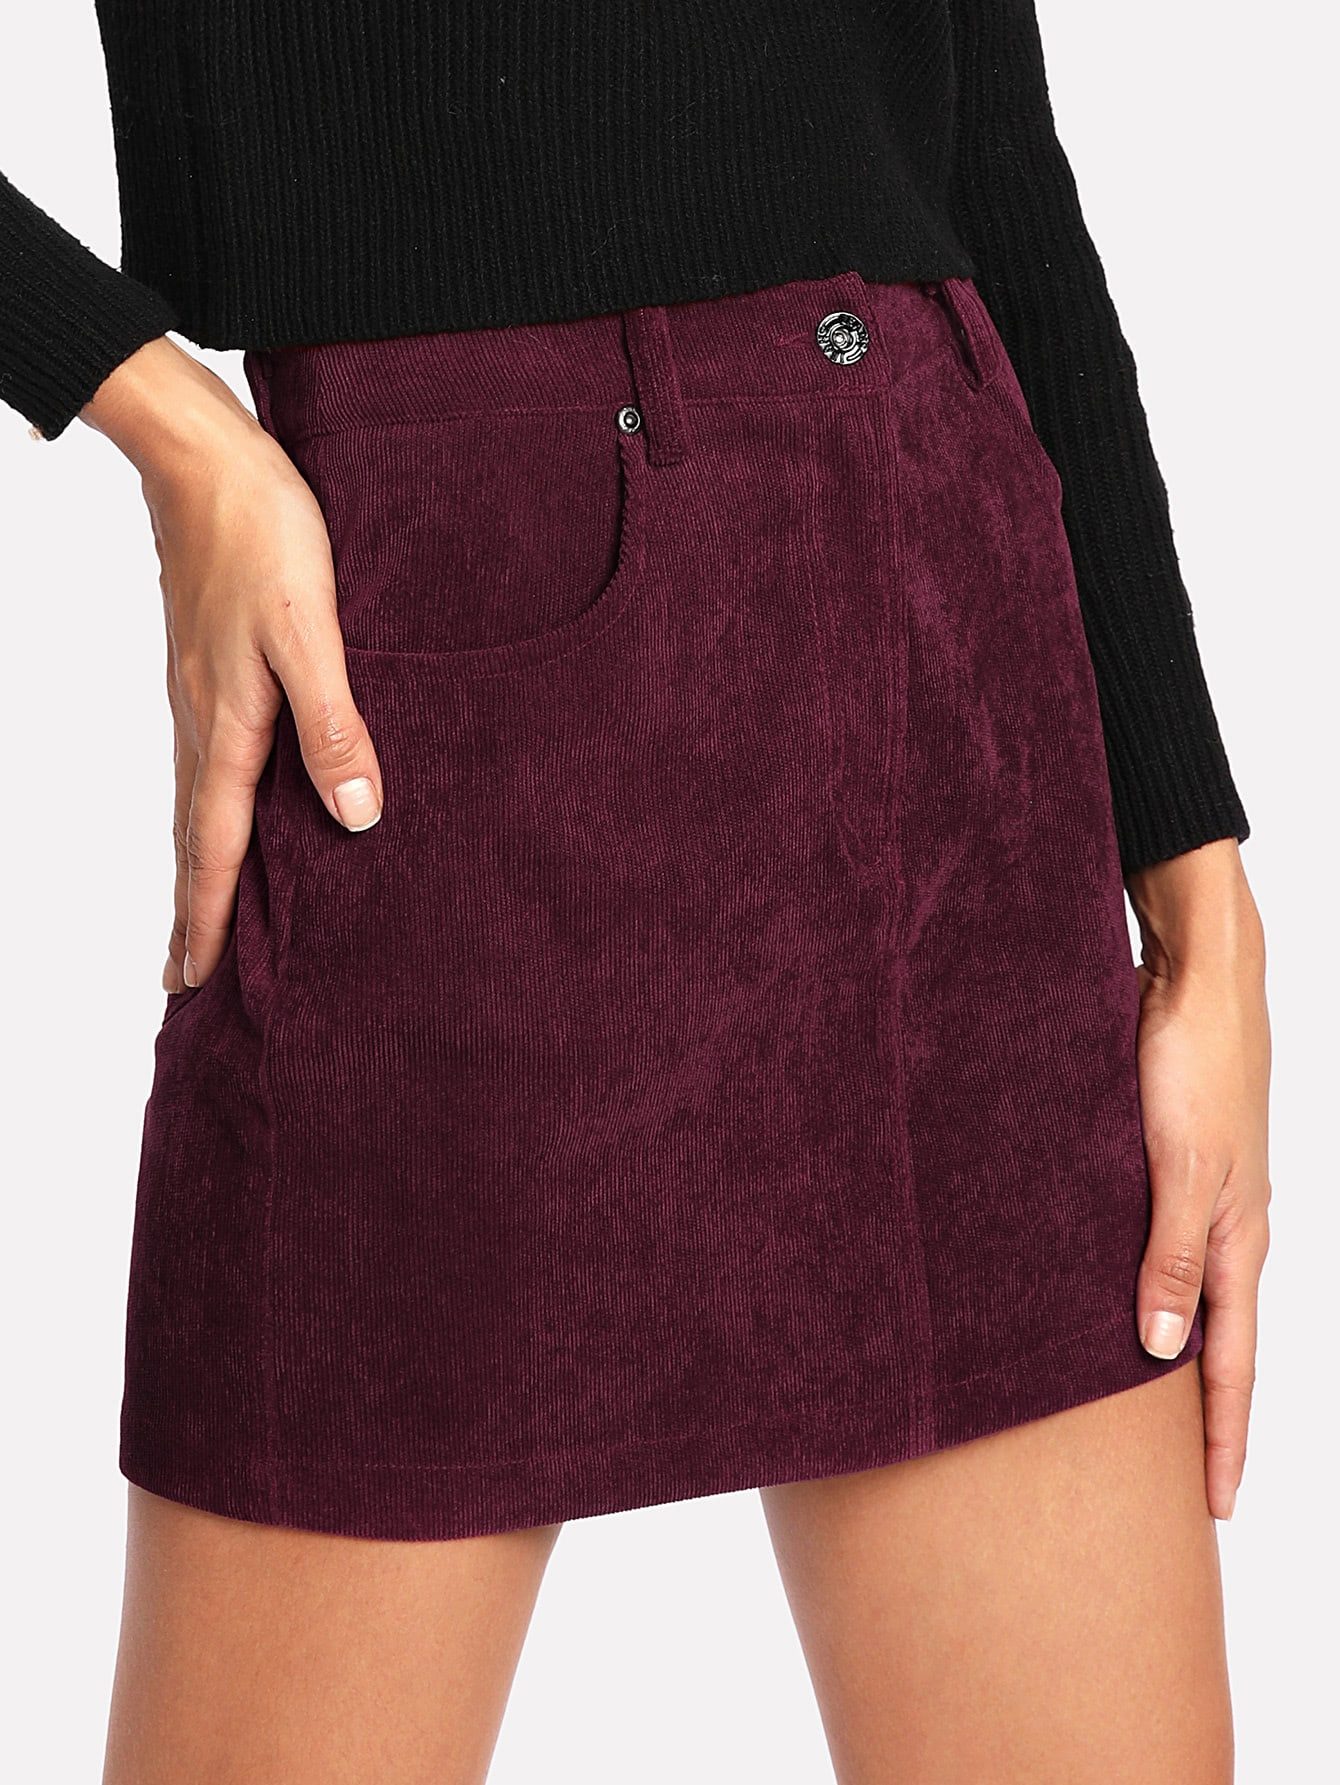 Zip Fly Cord Skirt